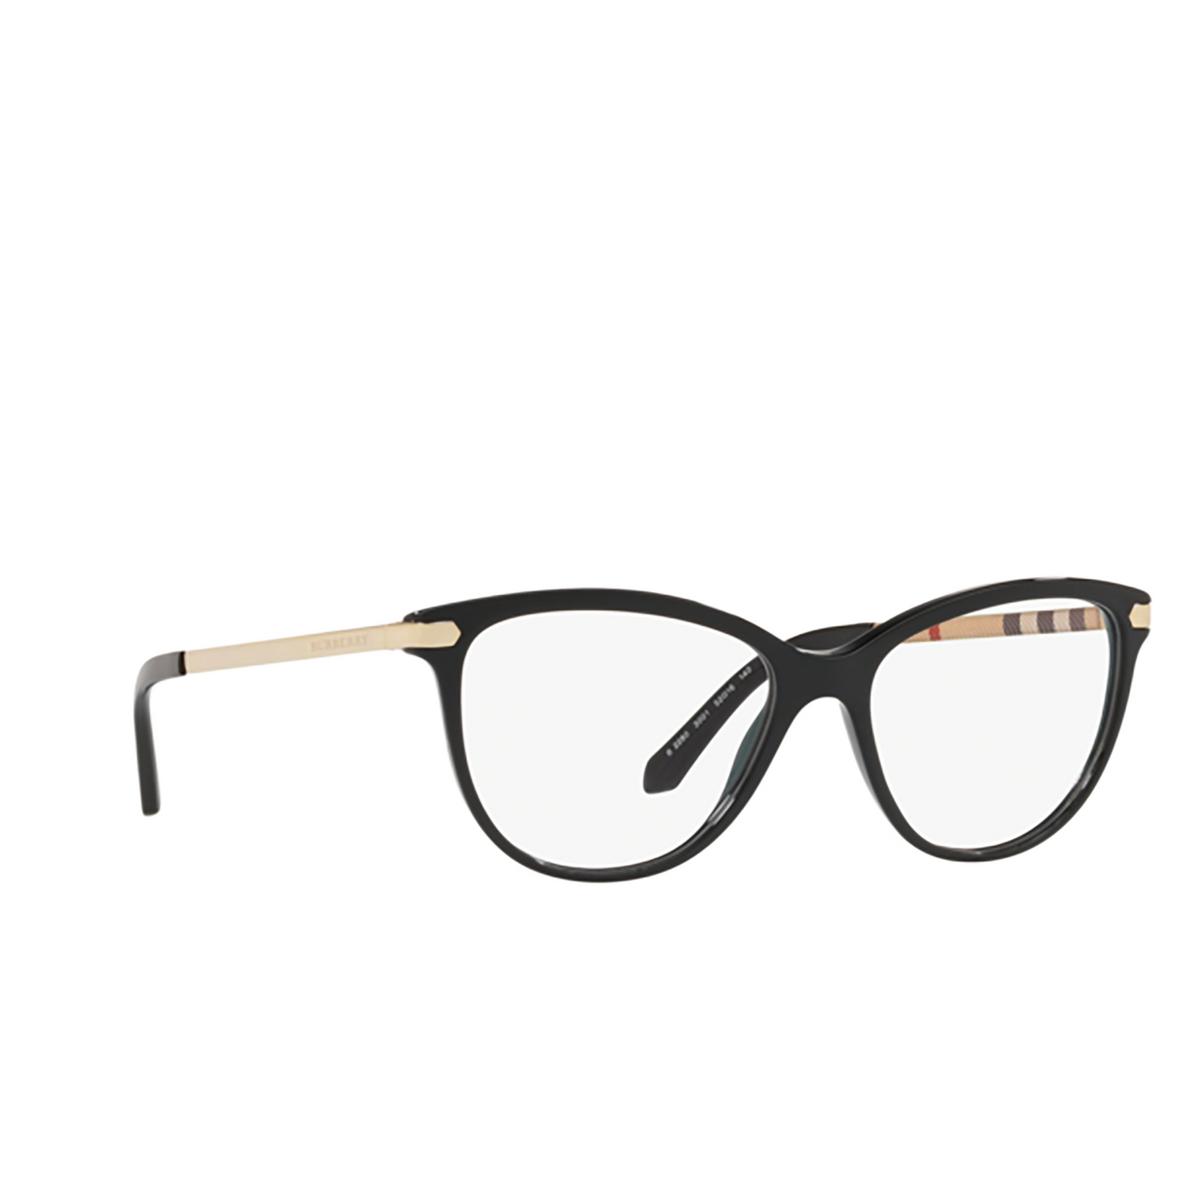 Burberry® Cat-eye Eyeglasses: BE2280 color Black 3001 - three-quarters view.